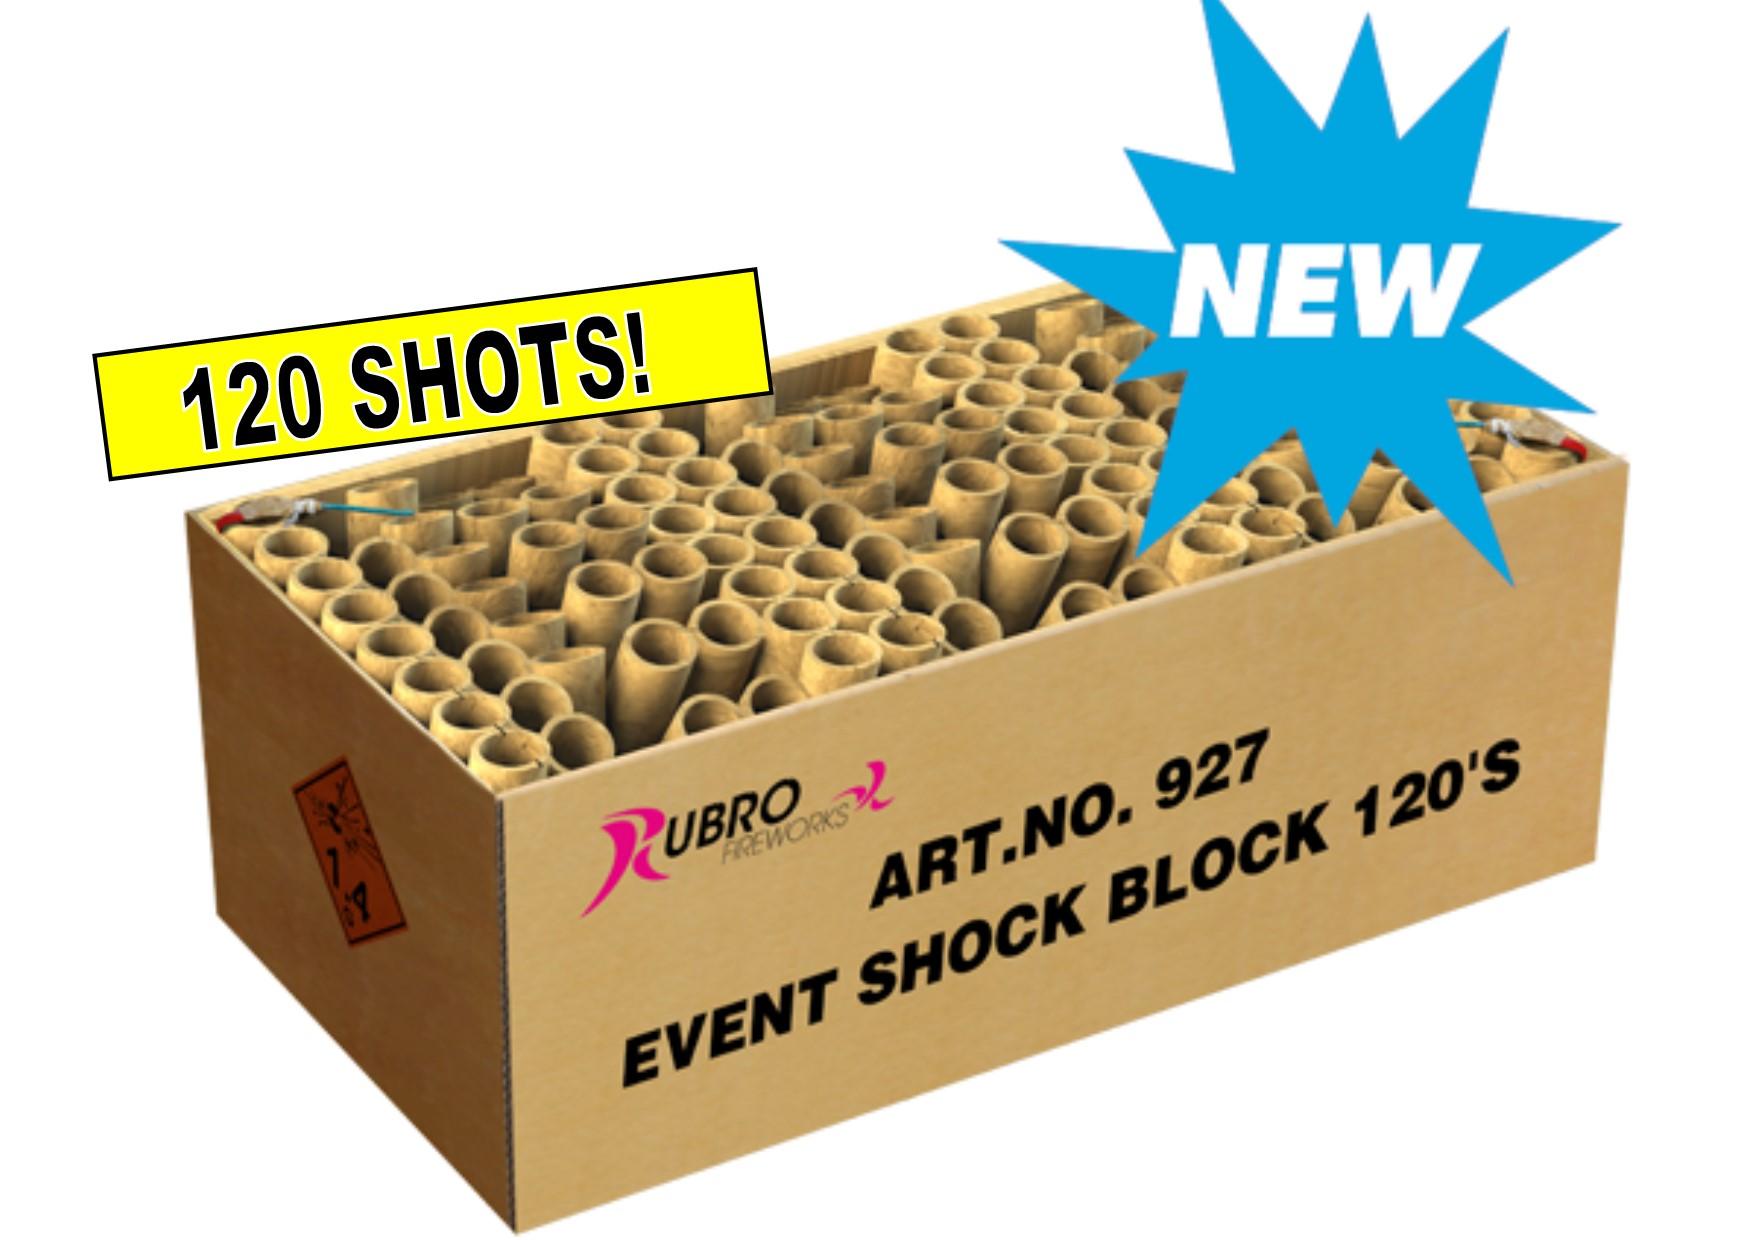 ART. 927 EVENT SHOCK BLOCK, 120 SHOTS